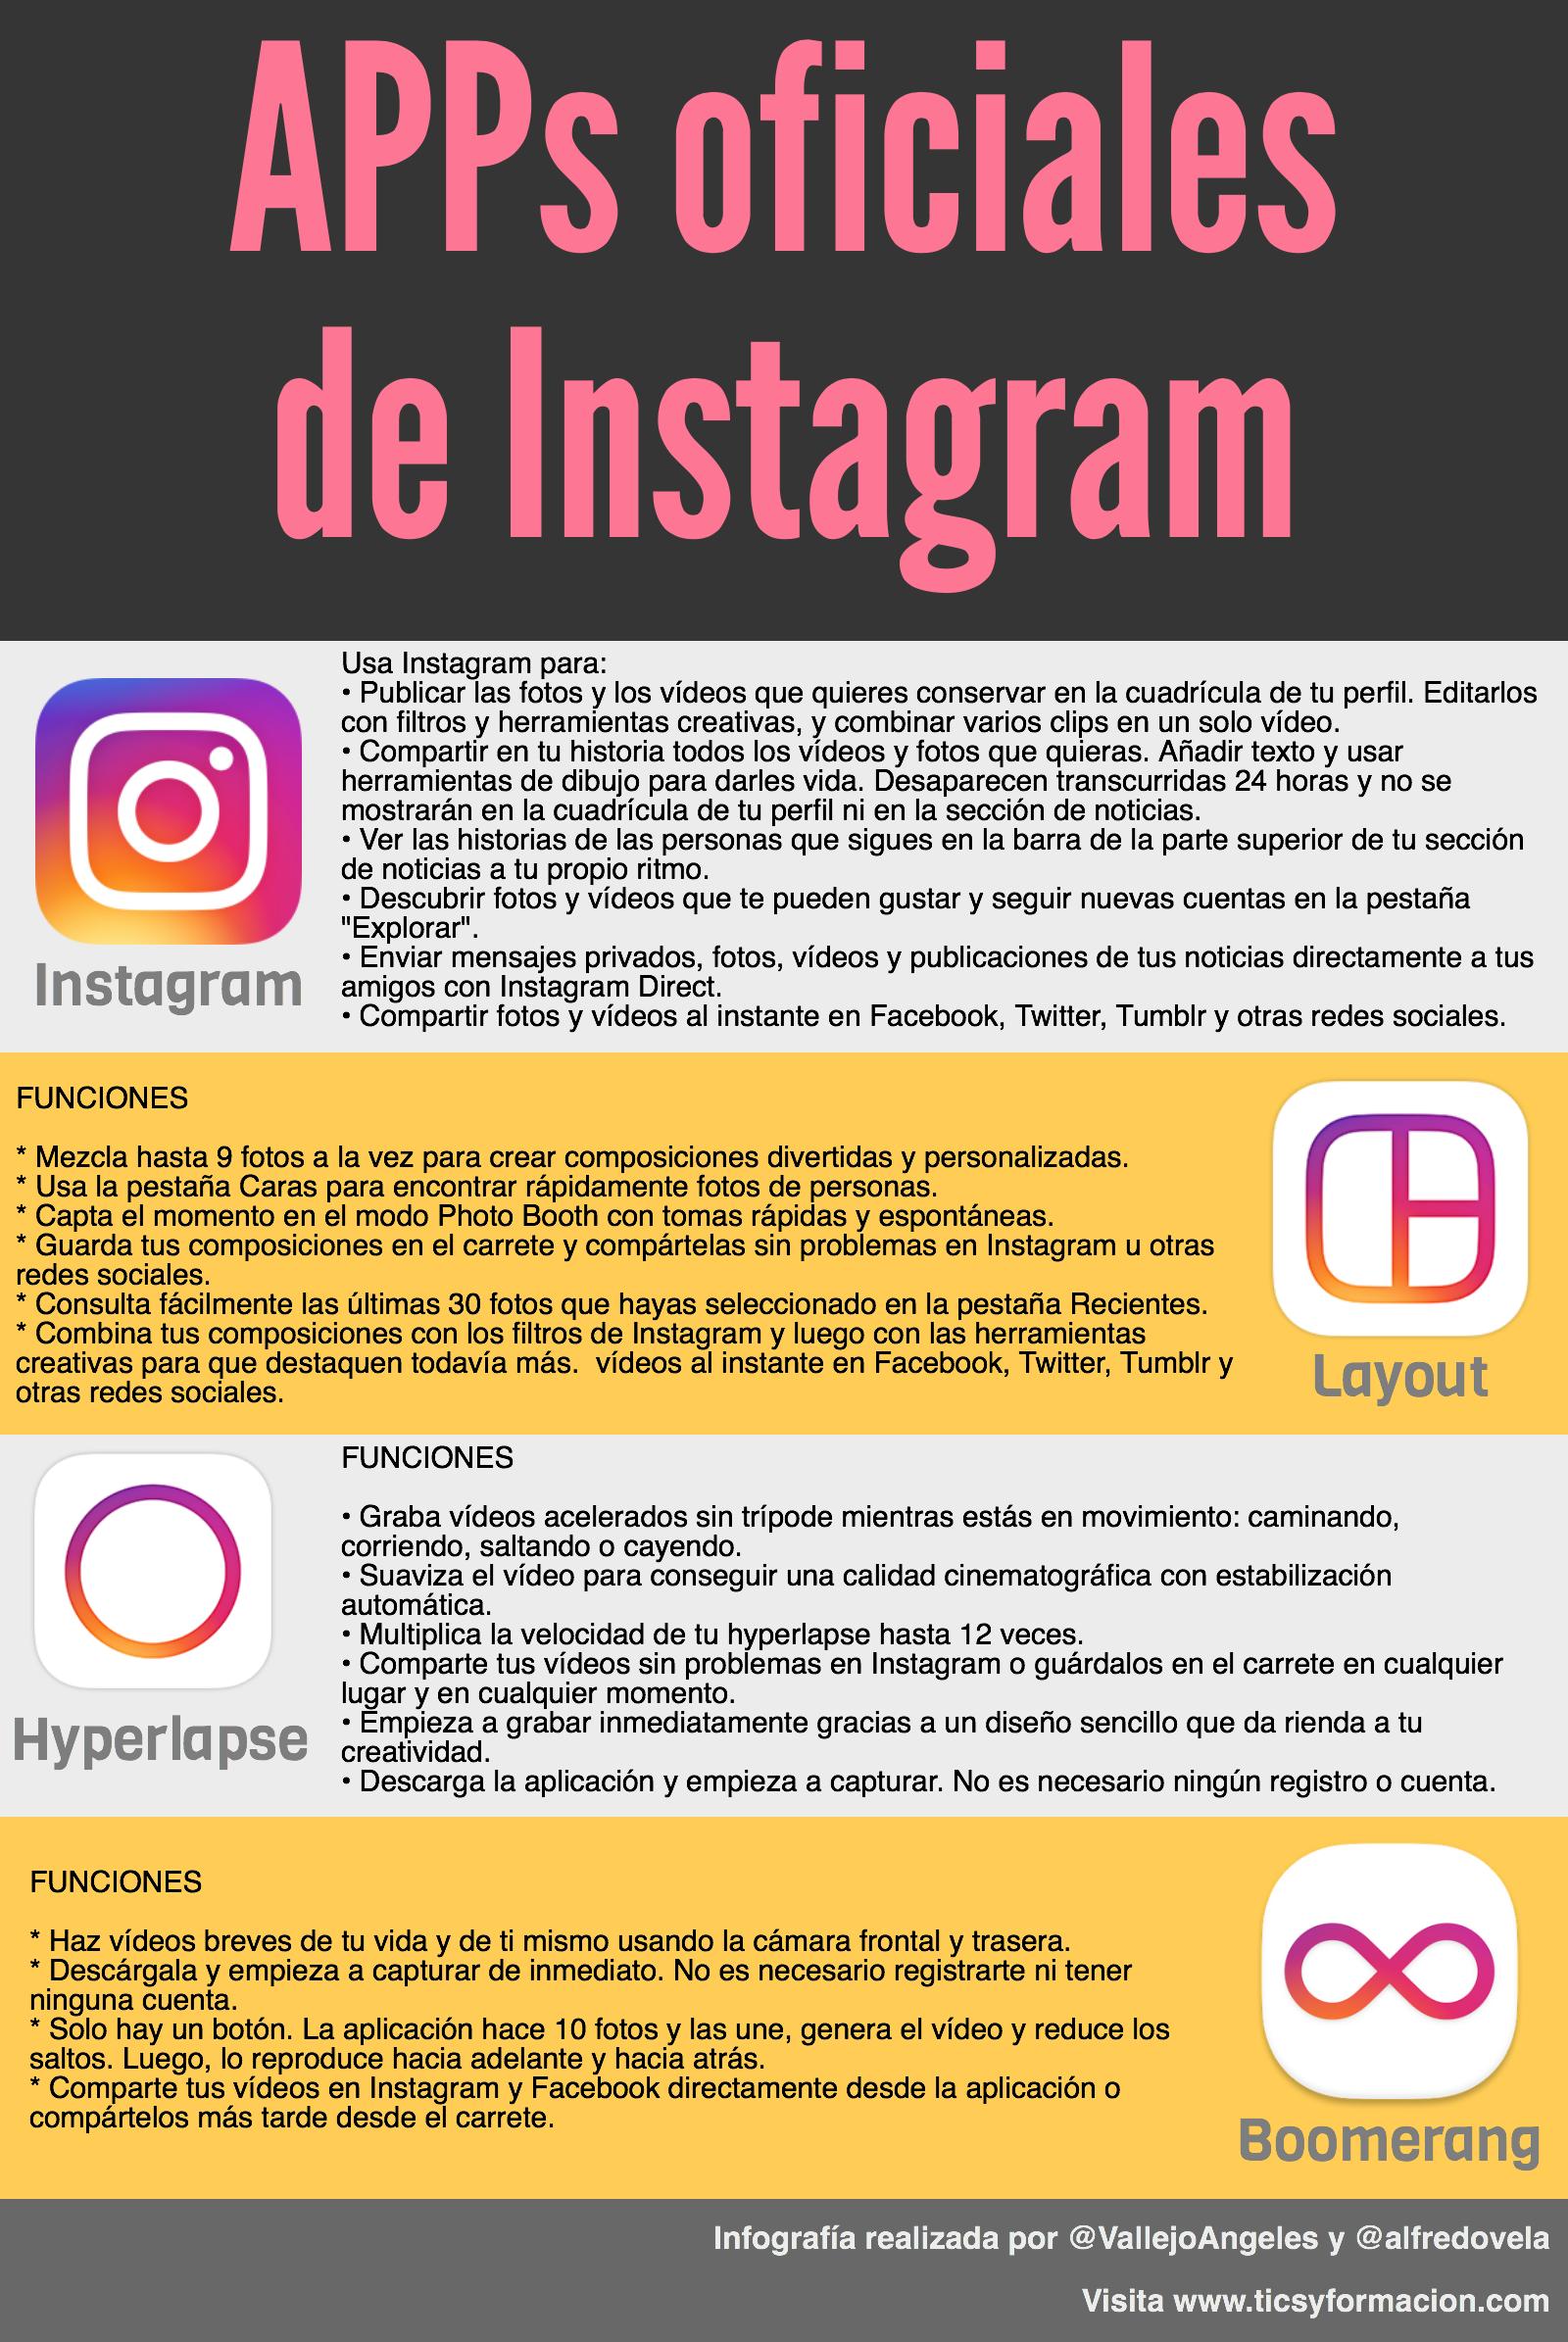 APPs oficiales de Instagram #infografia #infographic #socialmedia